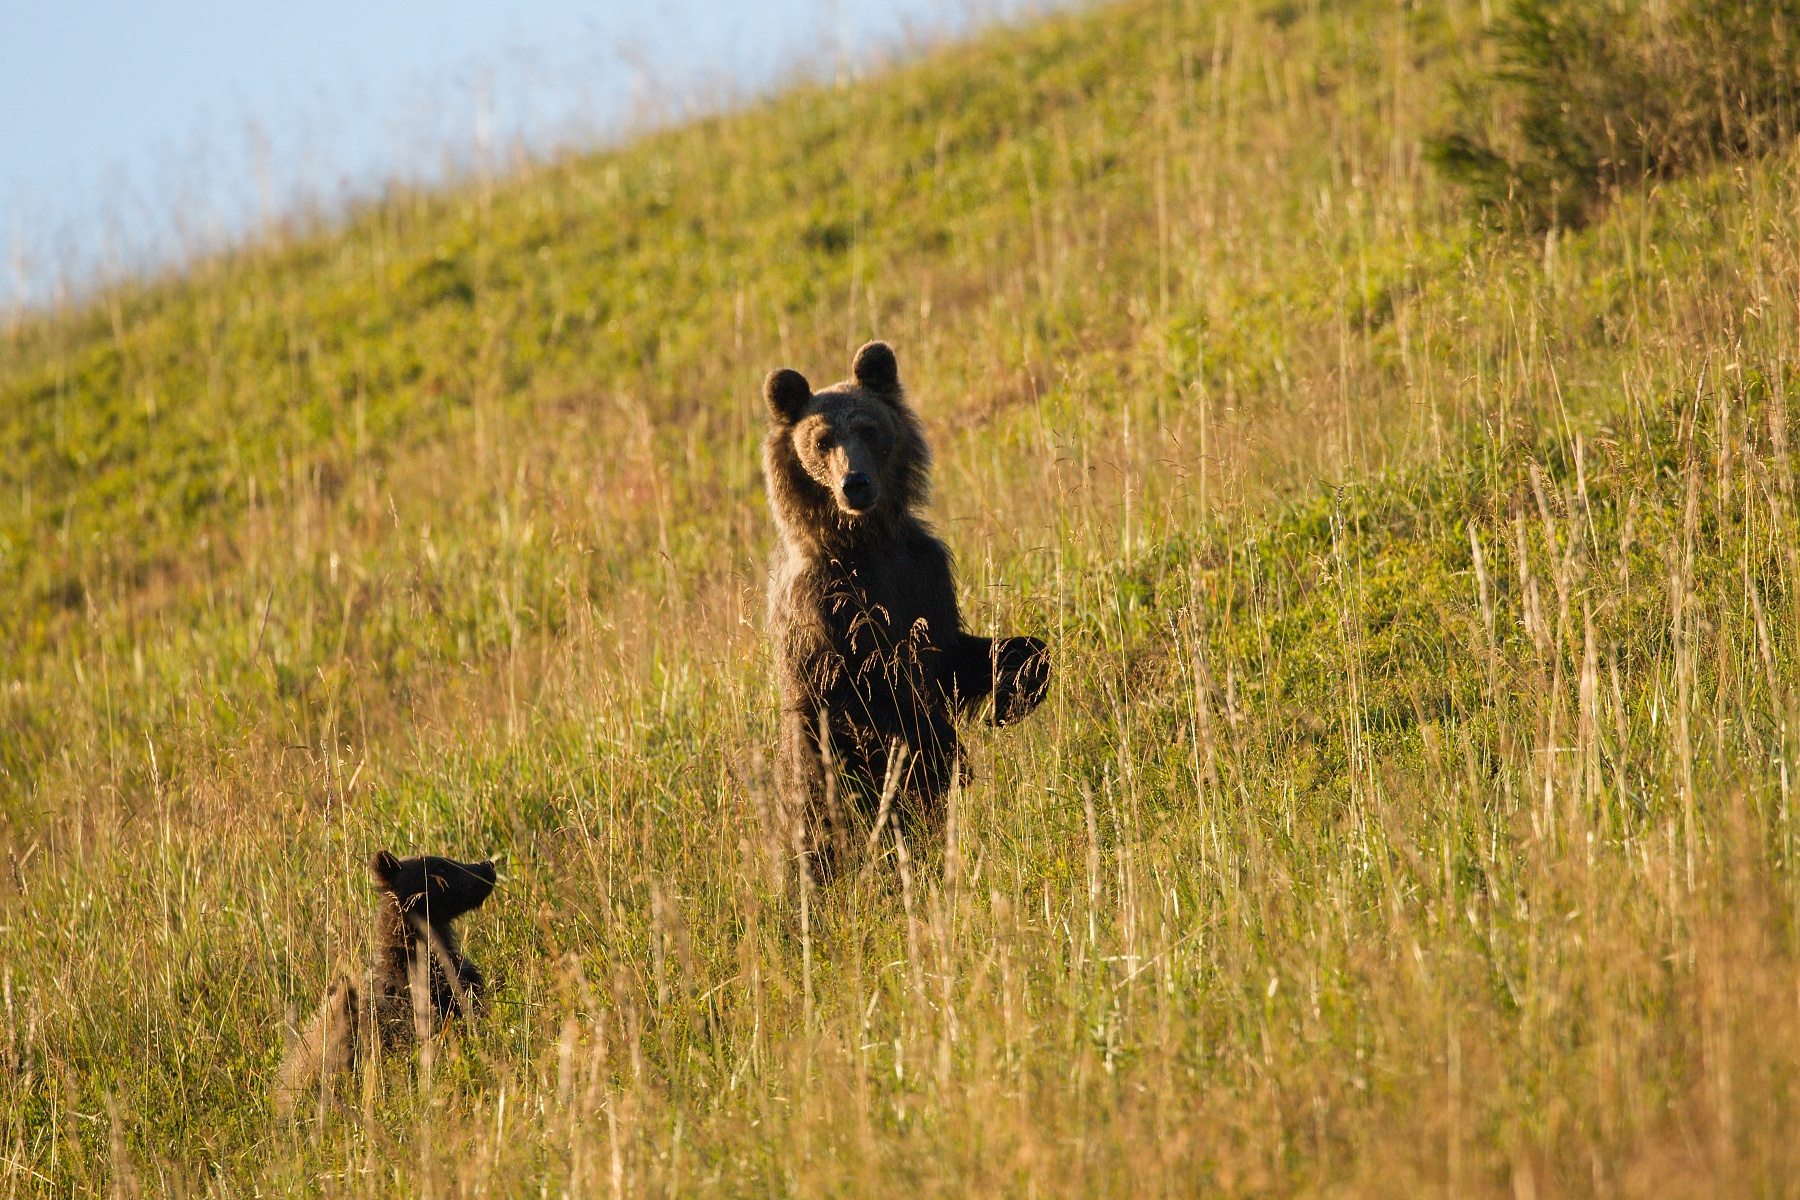 medveď hnedý (Ursus arctos) Brown bear, Veľká Fatra, Slovensko Canon EOS 6D mark II, Canon 100-400mm, f4.5-5.6 L IS II USM, 400 mm, f6.3, 1/800, ISO 800, 21. august 2020